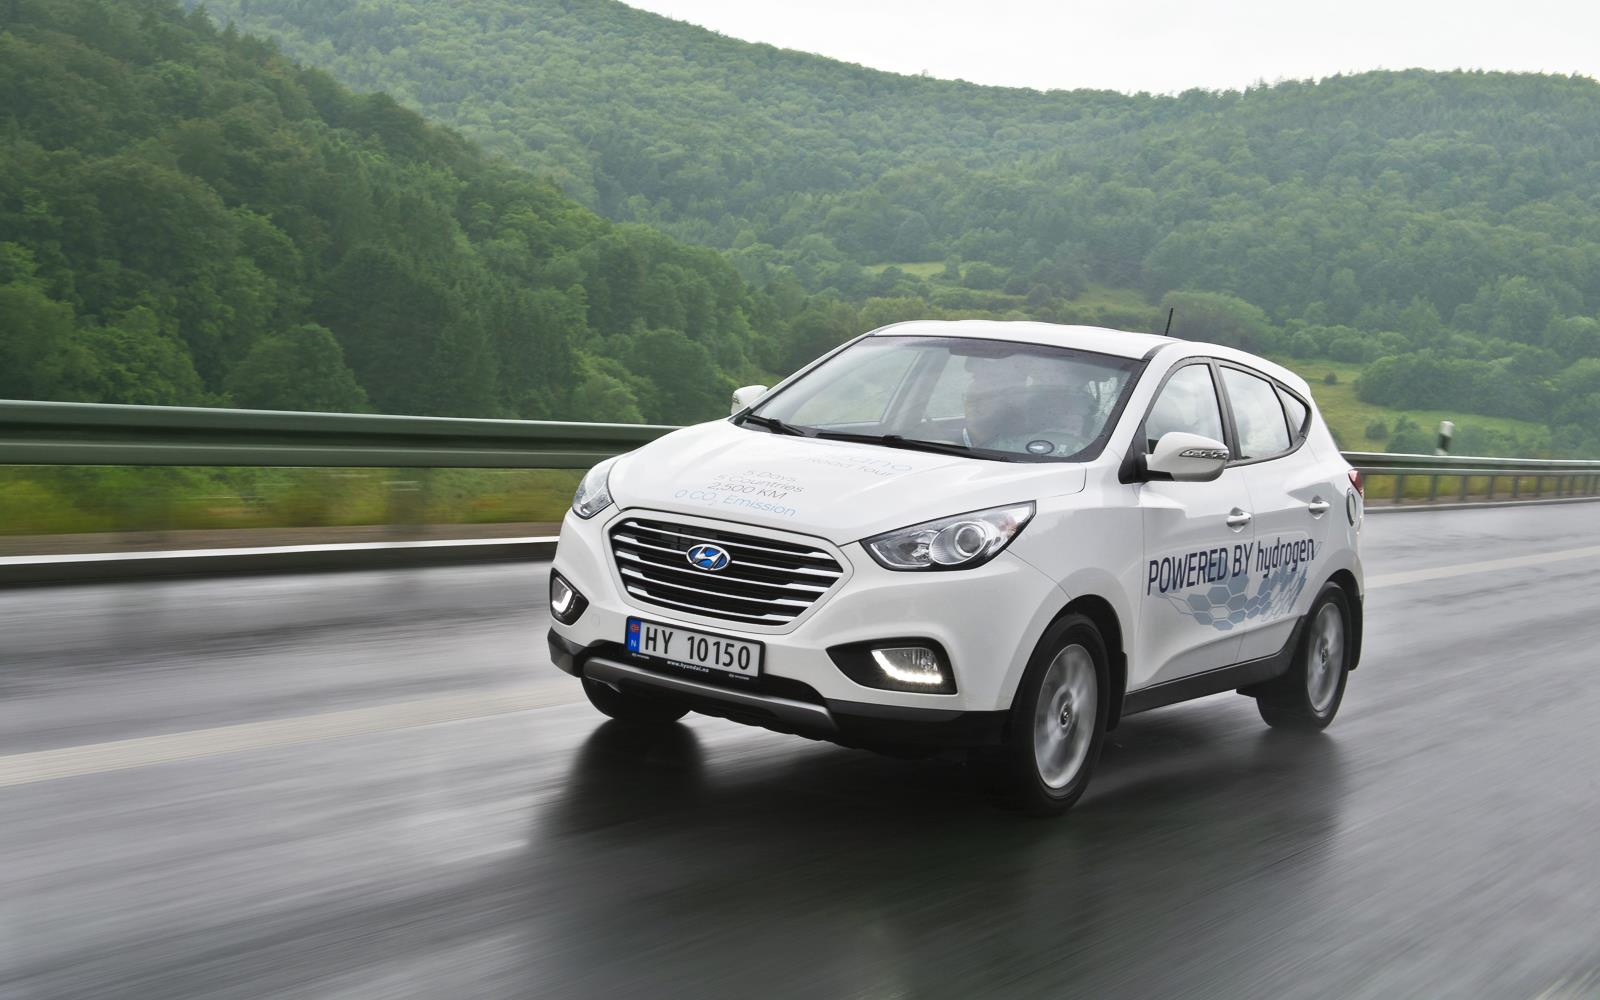 Photo of Hyundai ix35 Fuel Cell'den rekor düzeyde yüksek hız ve menzil